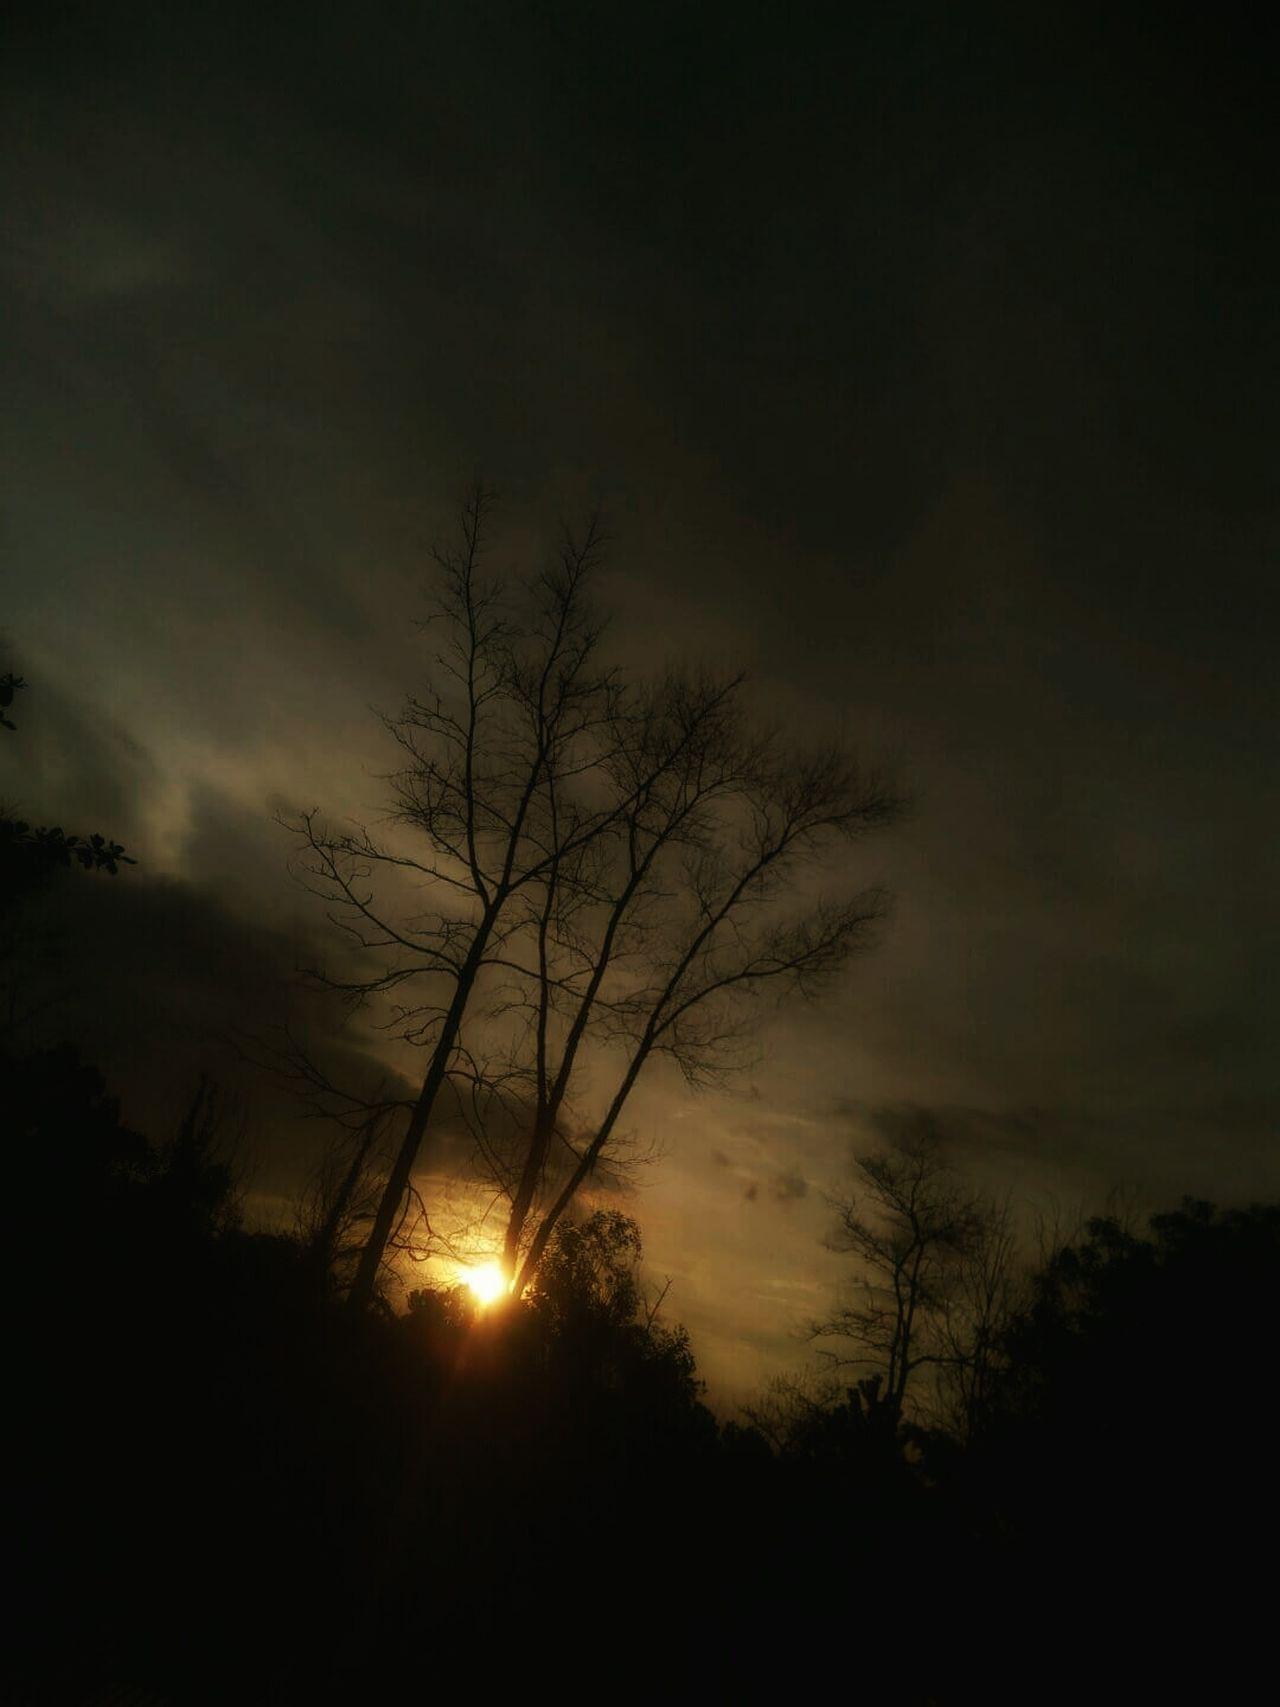 Whay? Silhouette Tranquil Scene Scenics Outdoors Cloud - Sky Night Photography Mahasiswa_pku Samsung Umri Amazingindonesia Indonesiapunya Indonesiaku Indonesia_photography Dunia SamsungJ5 Gadgetgrapher_riau Netherlands